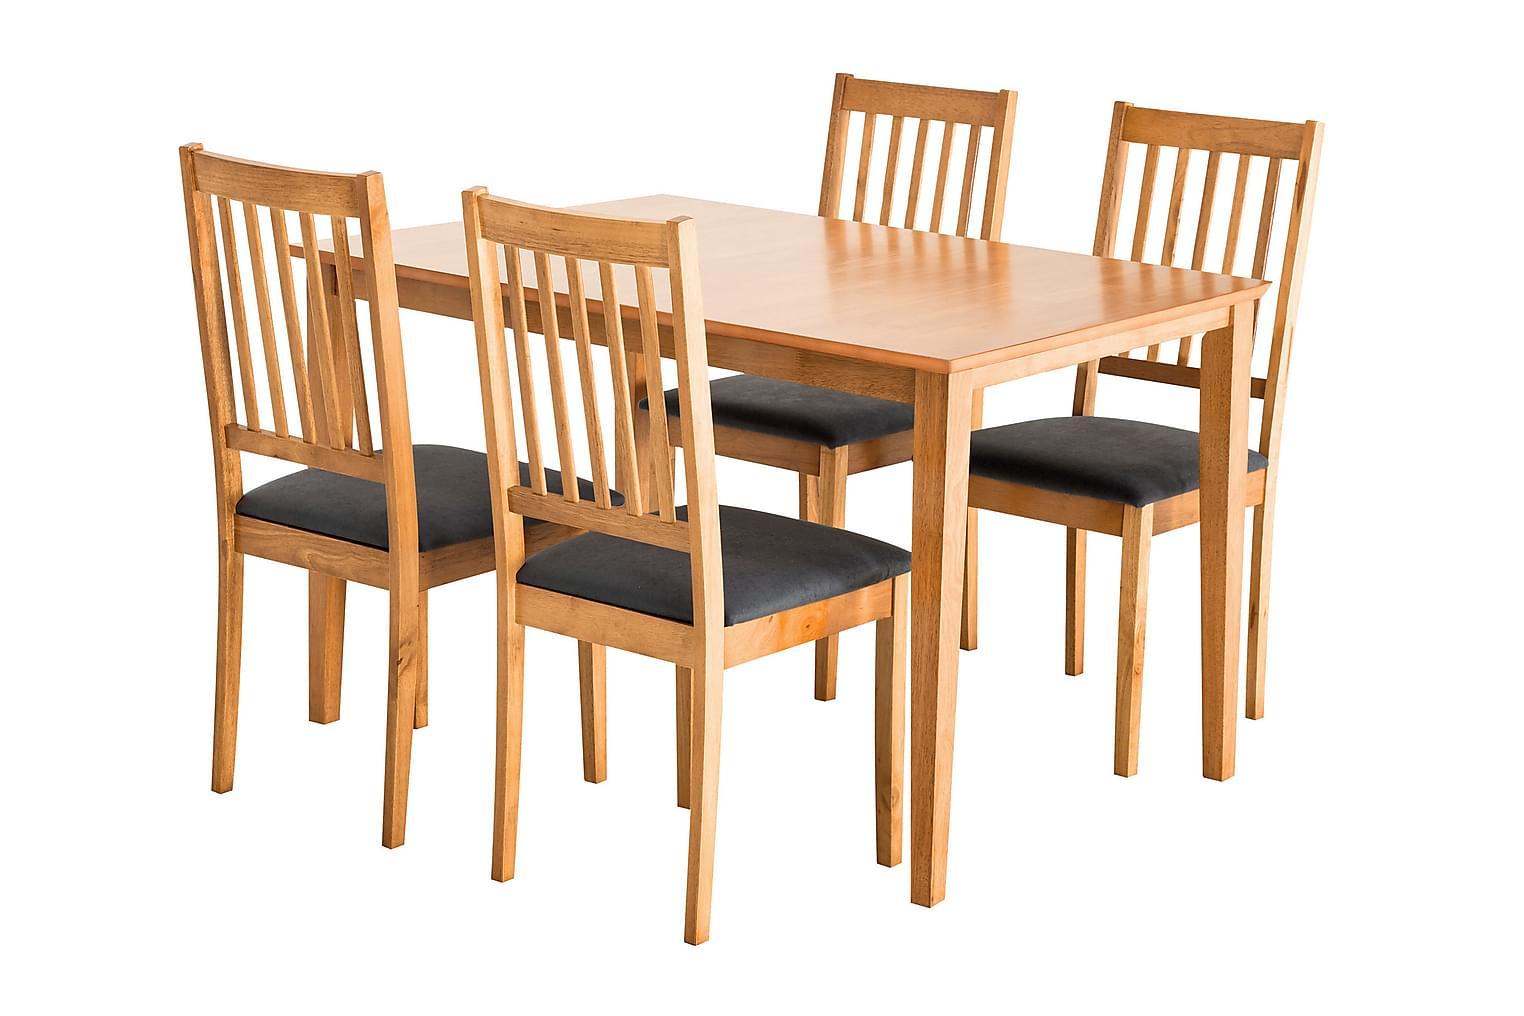 ALOR Pöytä 140 Tammi + 4 SETAR Tuolia Tammi/Harmaa